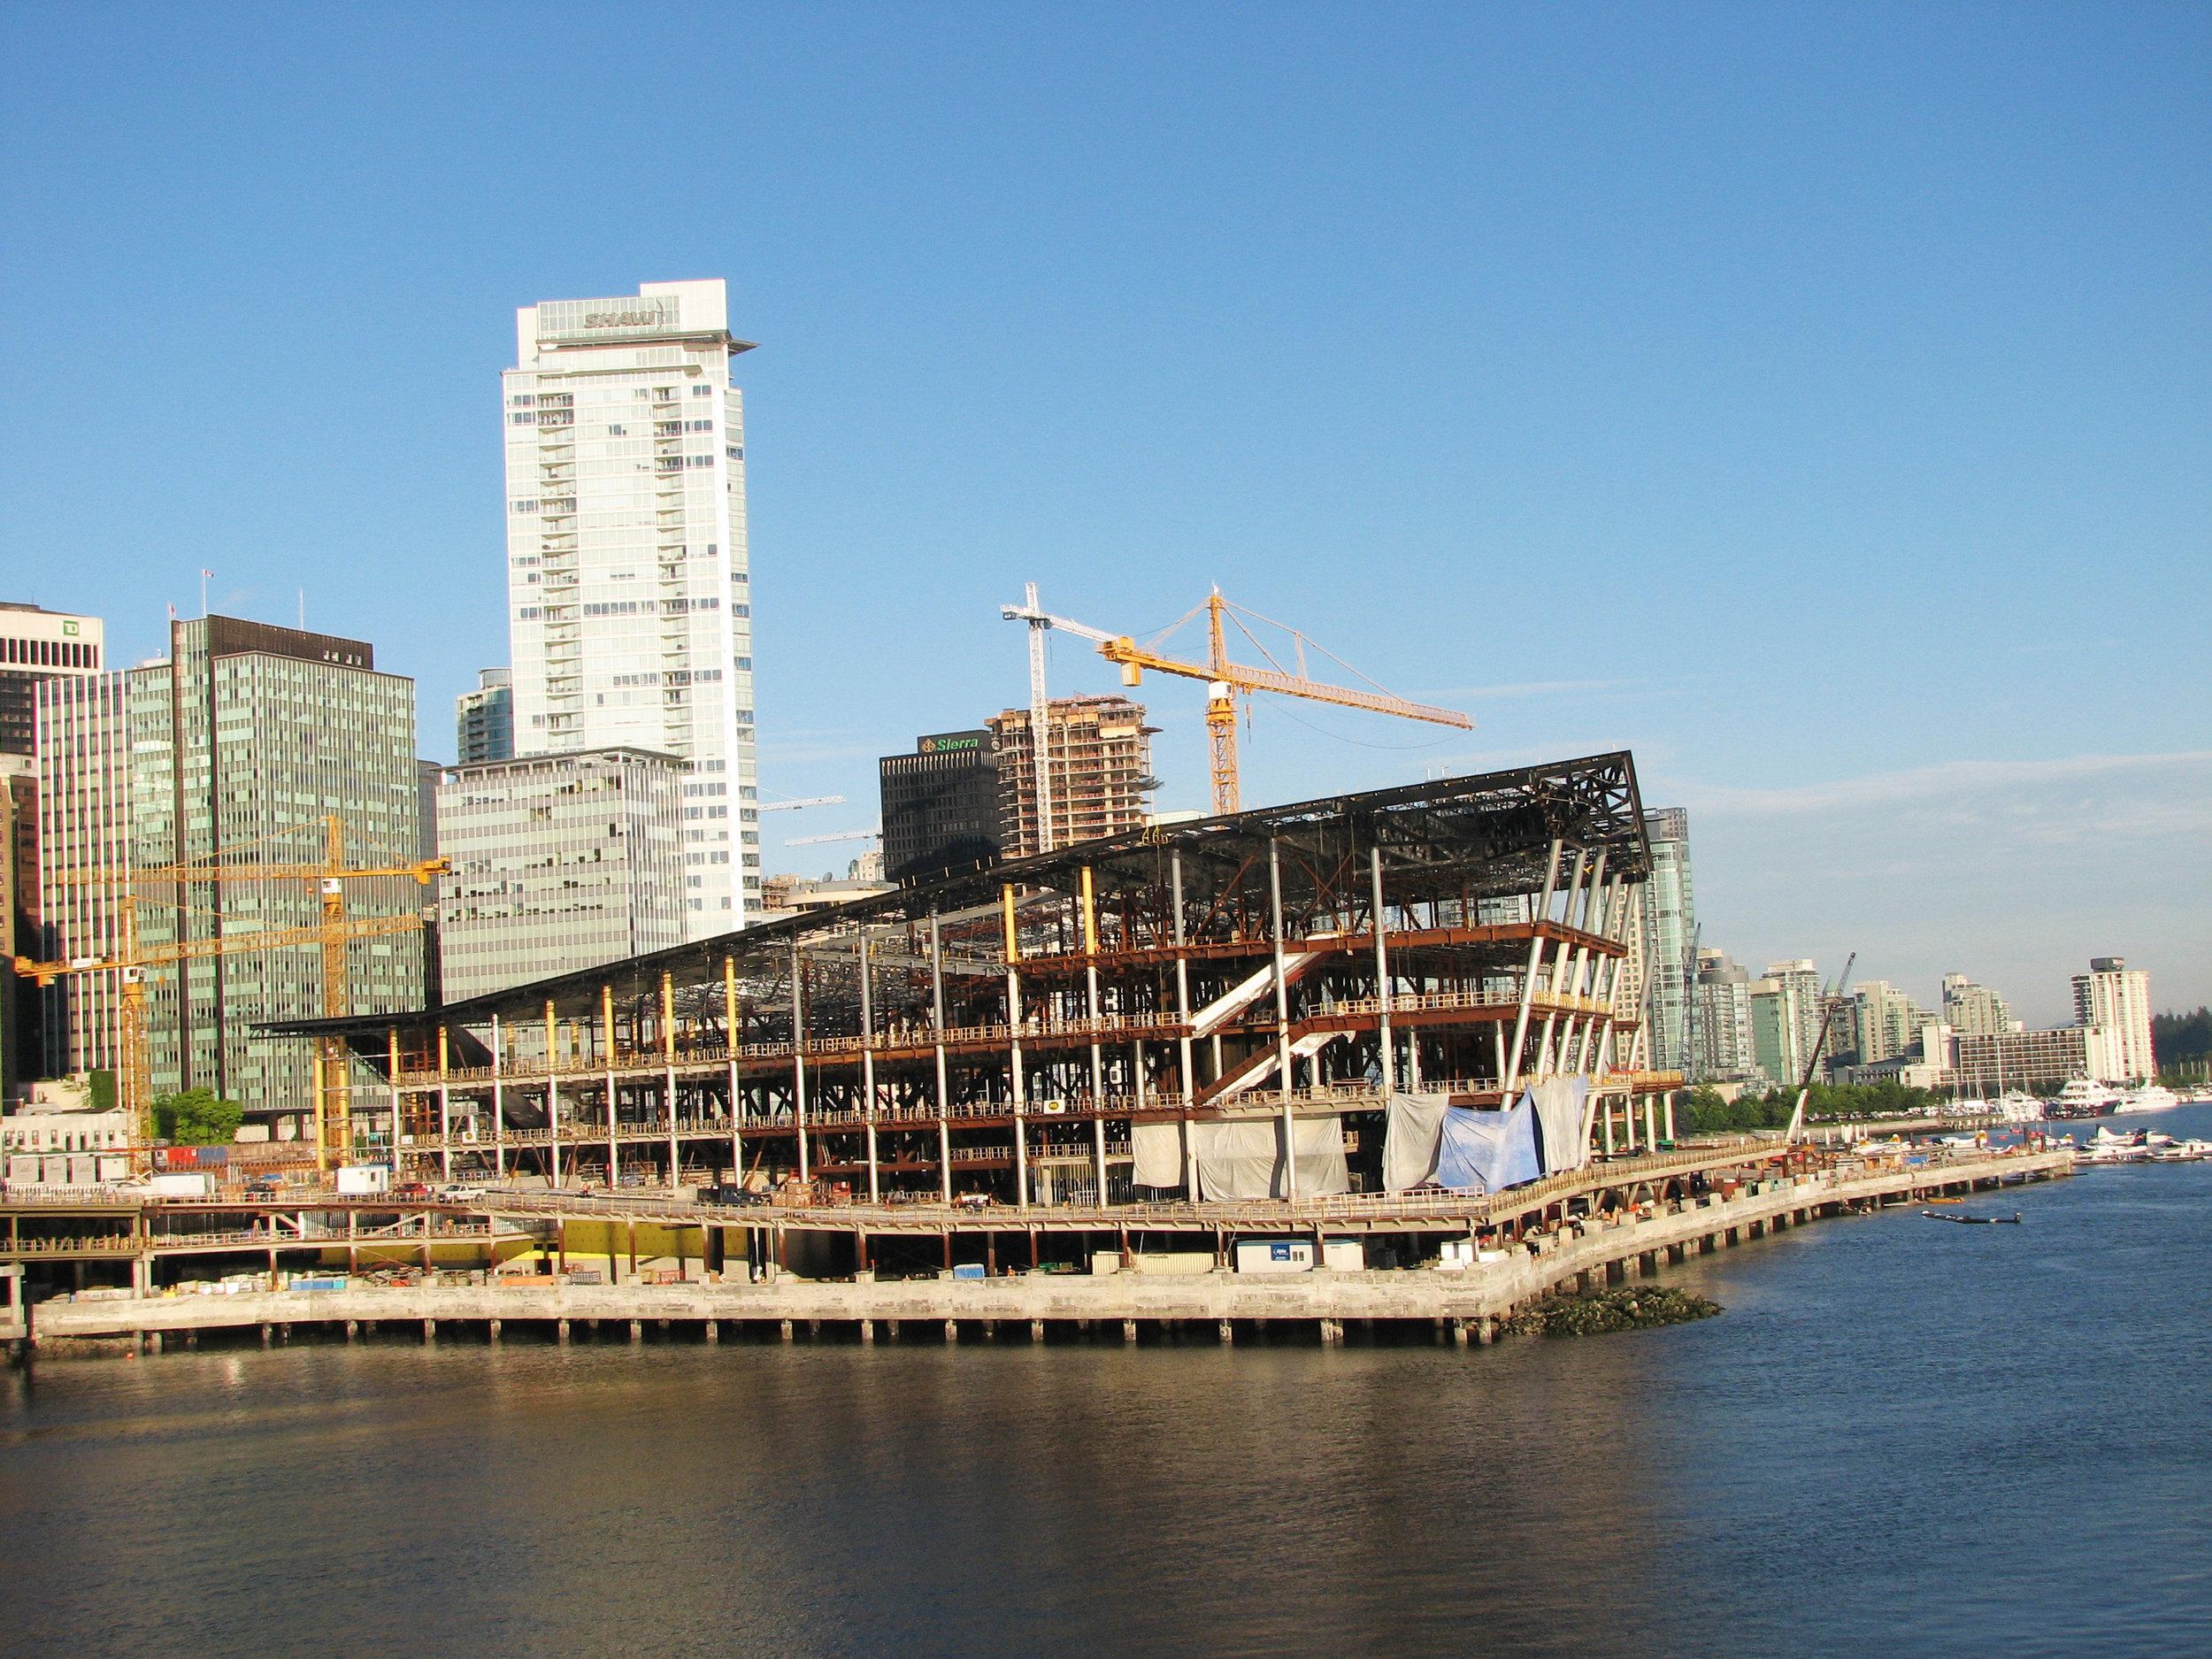 VancouverConventionCenterConstruction.jpg